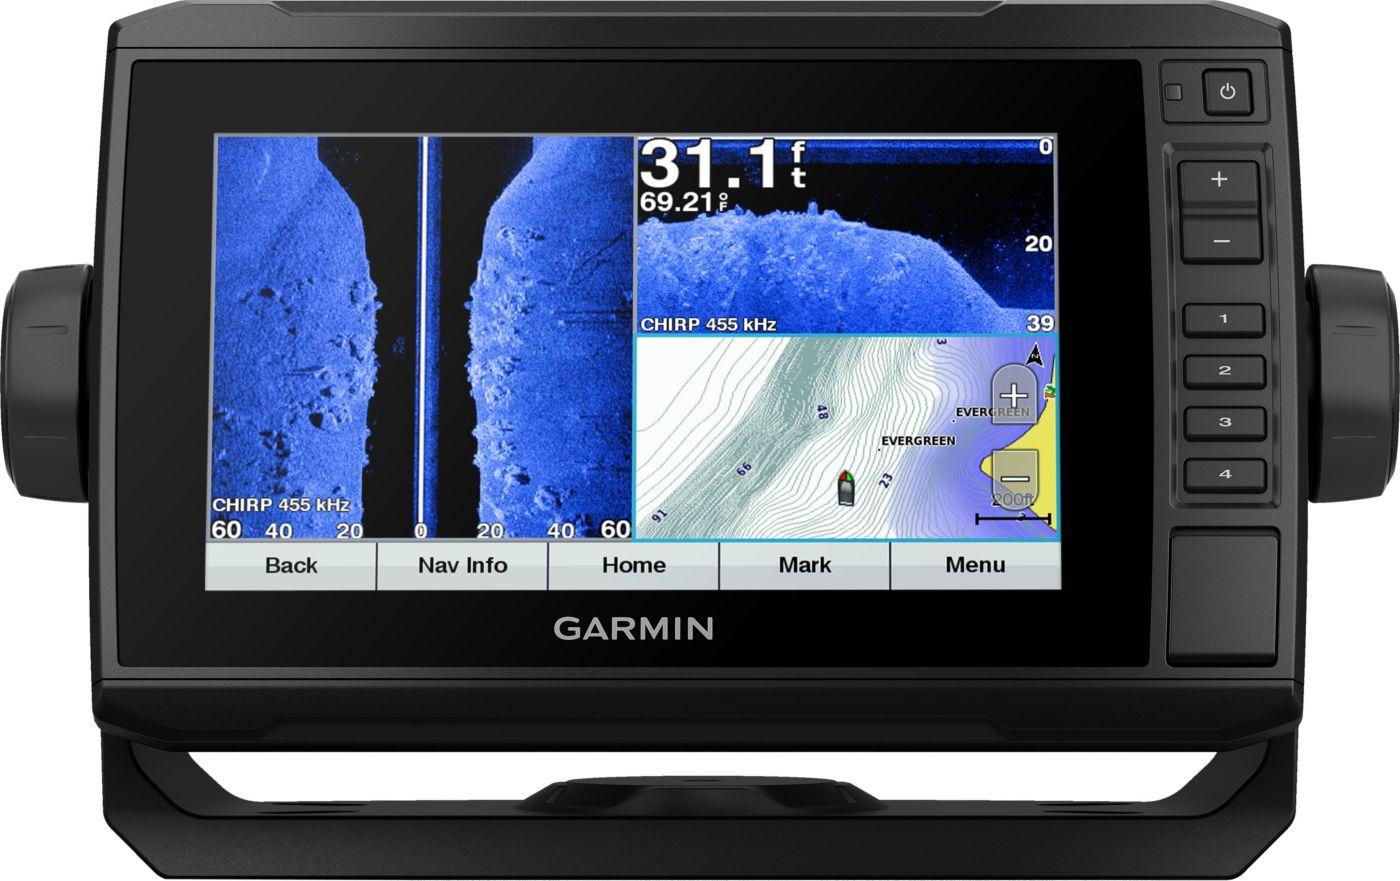 Garmin echoMAP Plus 73sv Lakevü G3 GPS Fish Finder (010-01897-05)